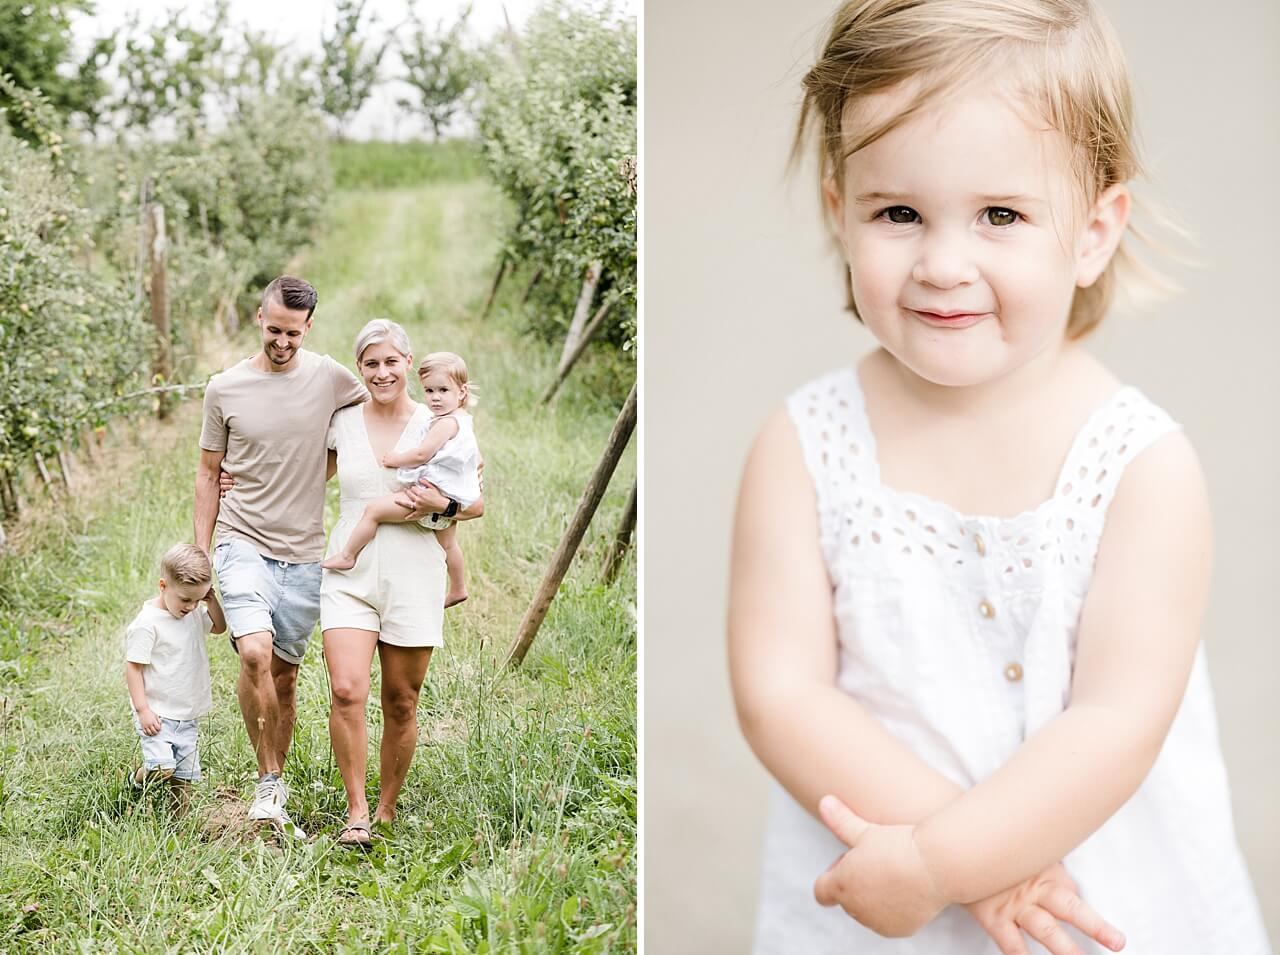 Rebecca Conte Fotografie: Familienbilder in Remseck 01